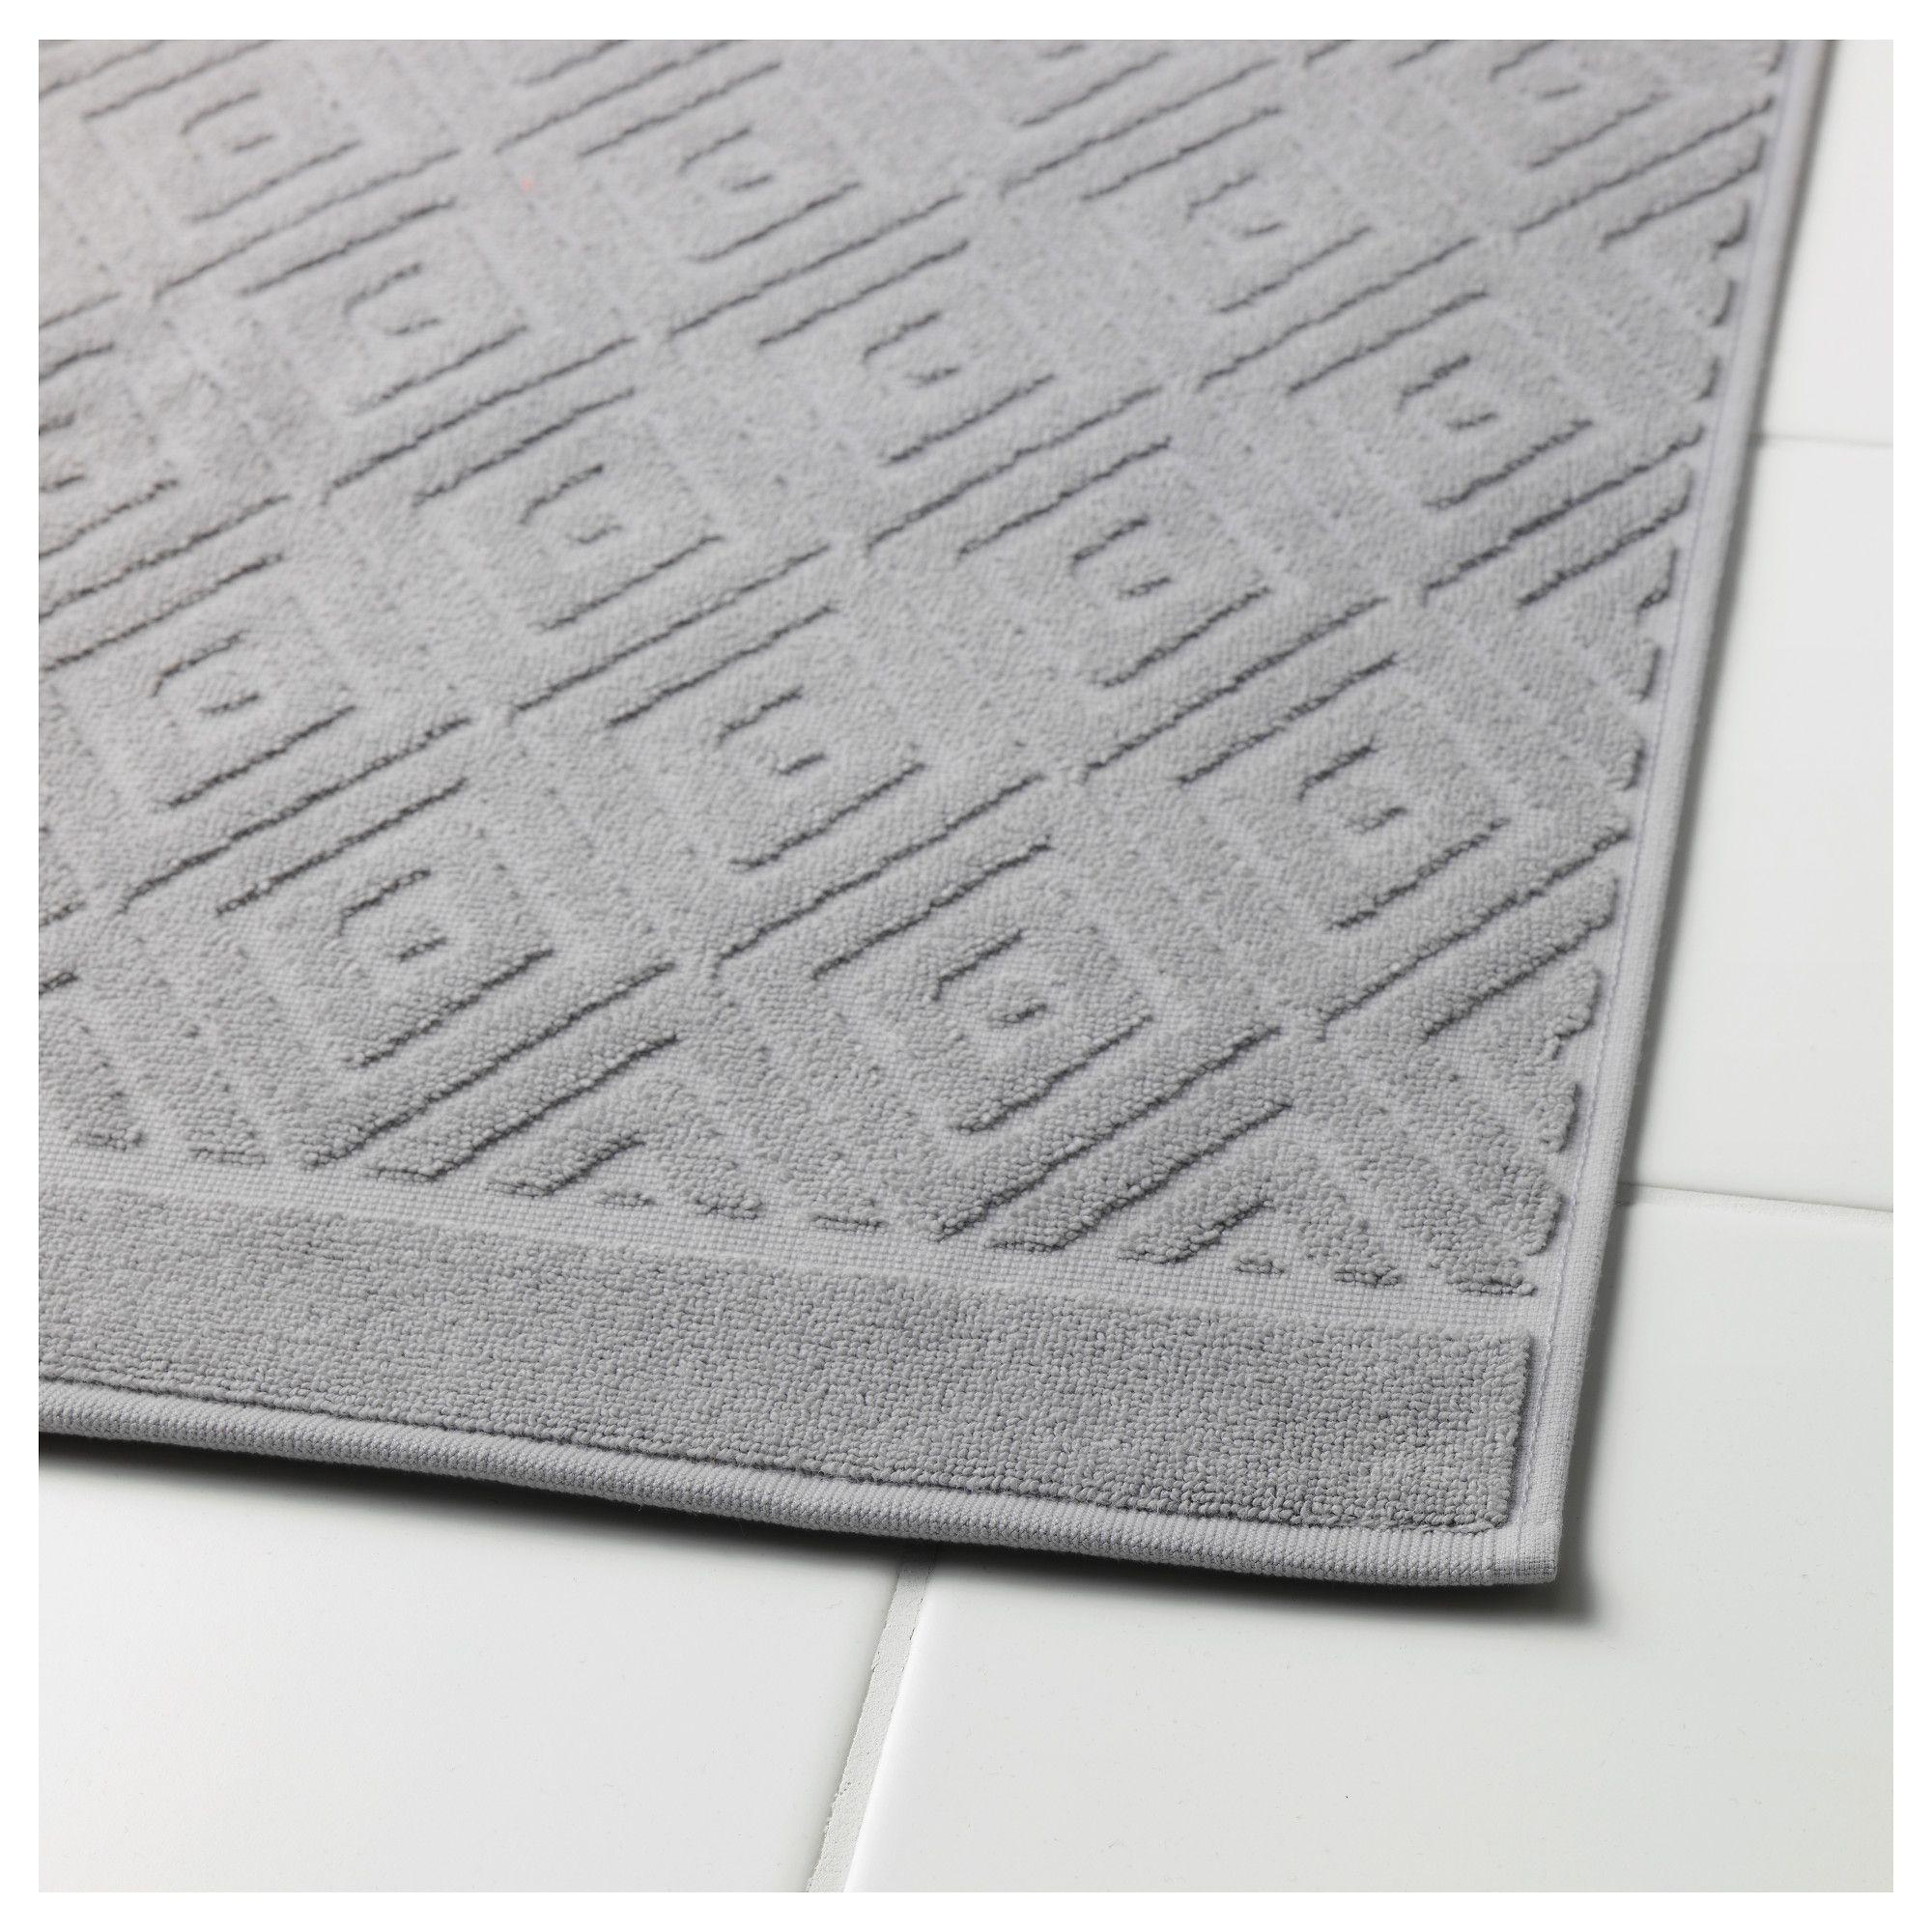 Super Shop for Furniture, Home Accessories & More | Bath mat, Grey bath LW-39